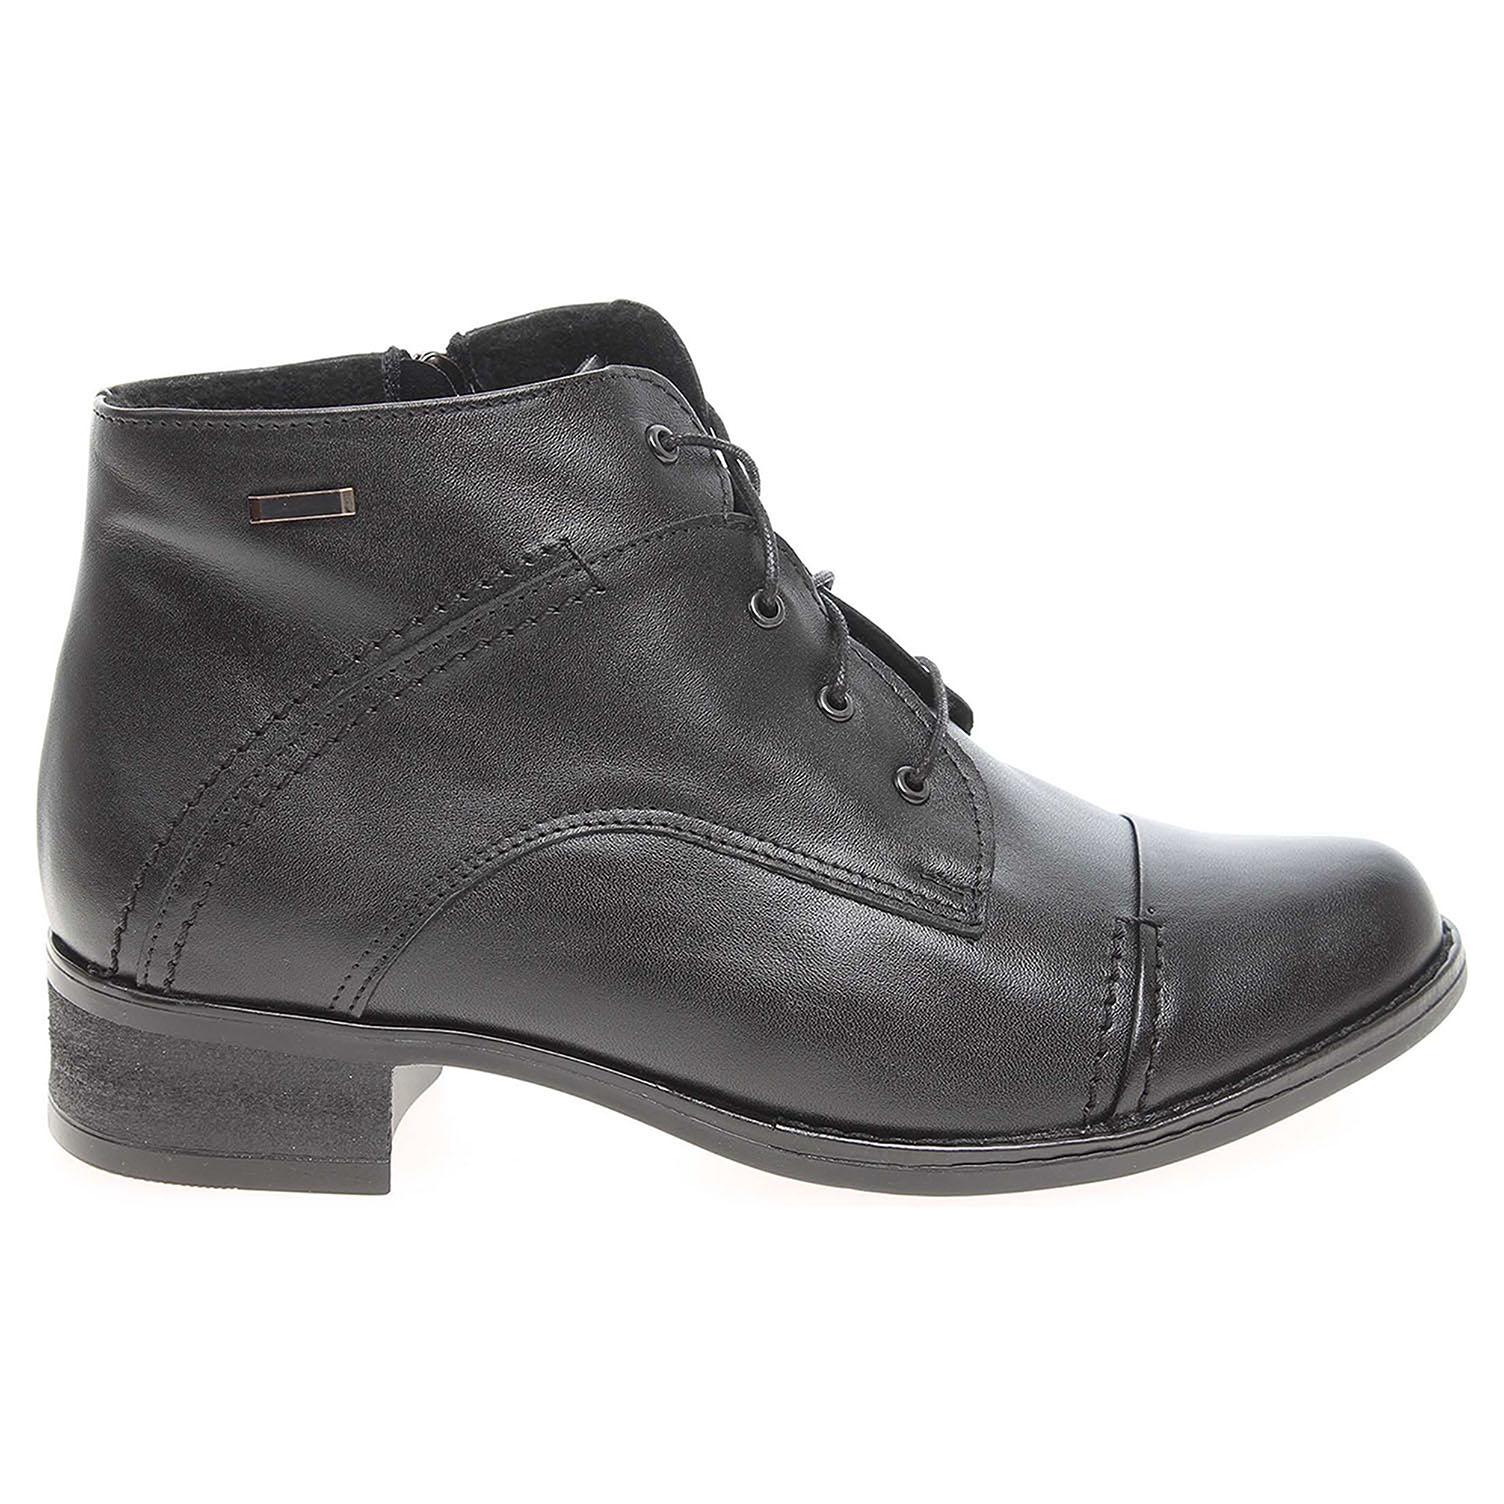 b6e7bb83904b Dámská kotníková obuv AR 754 černá AR 754 37